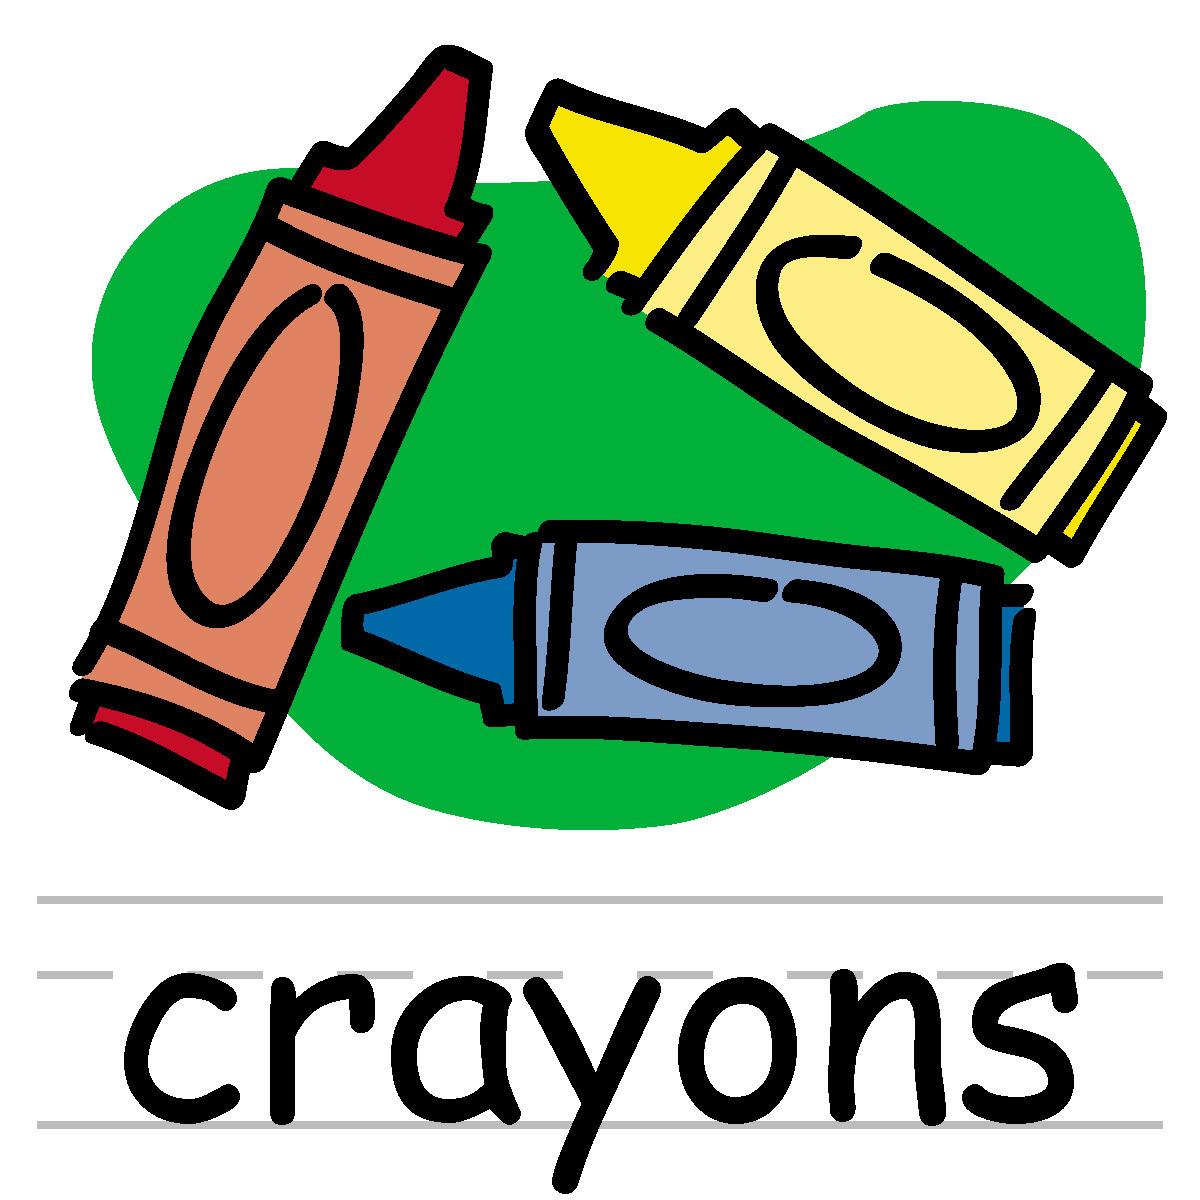 1200x1200 Crayola Crayon Box Clipart Clip Art 7 Color